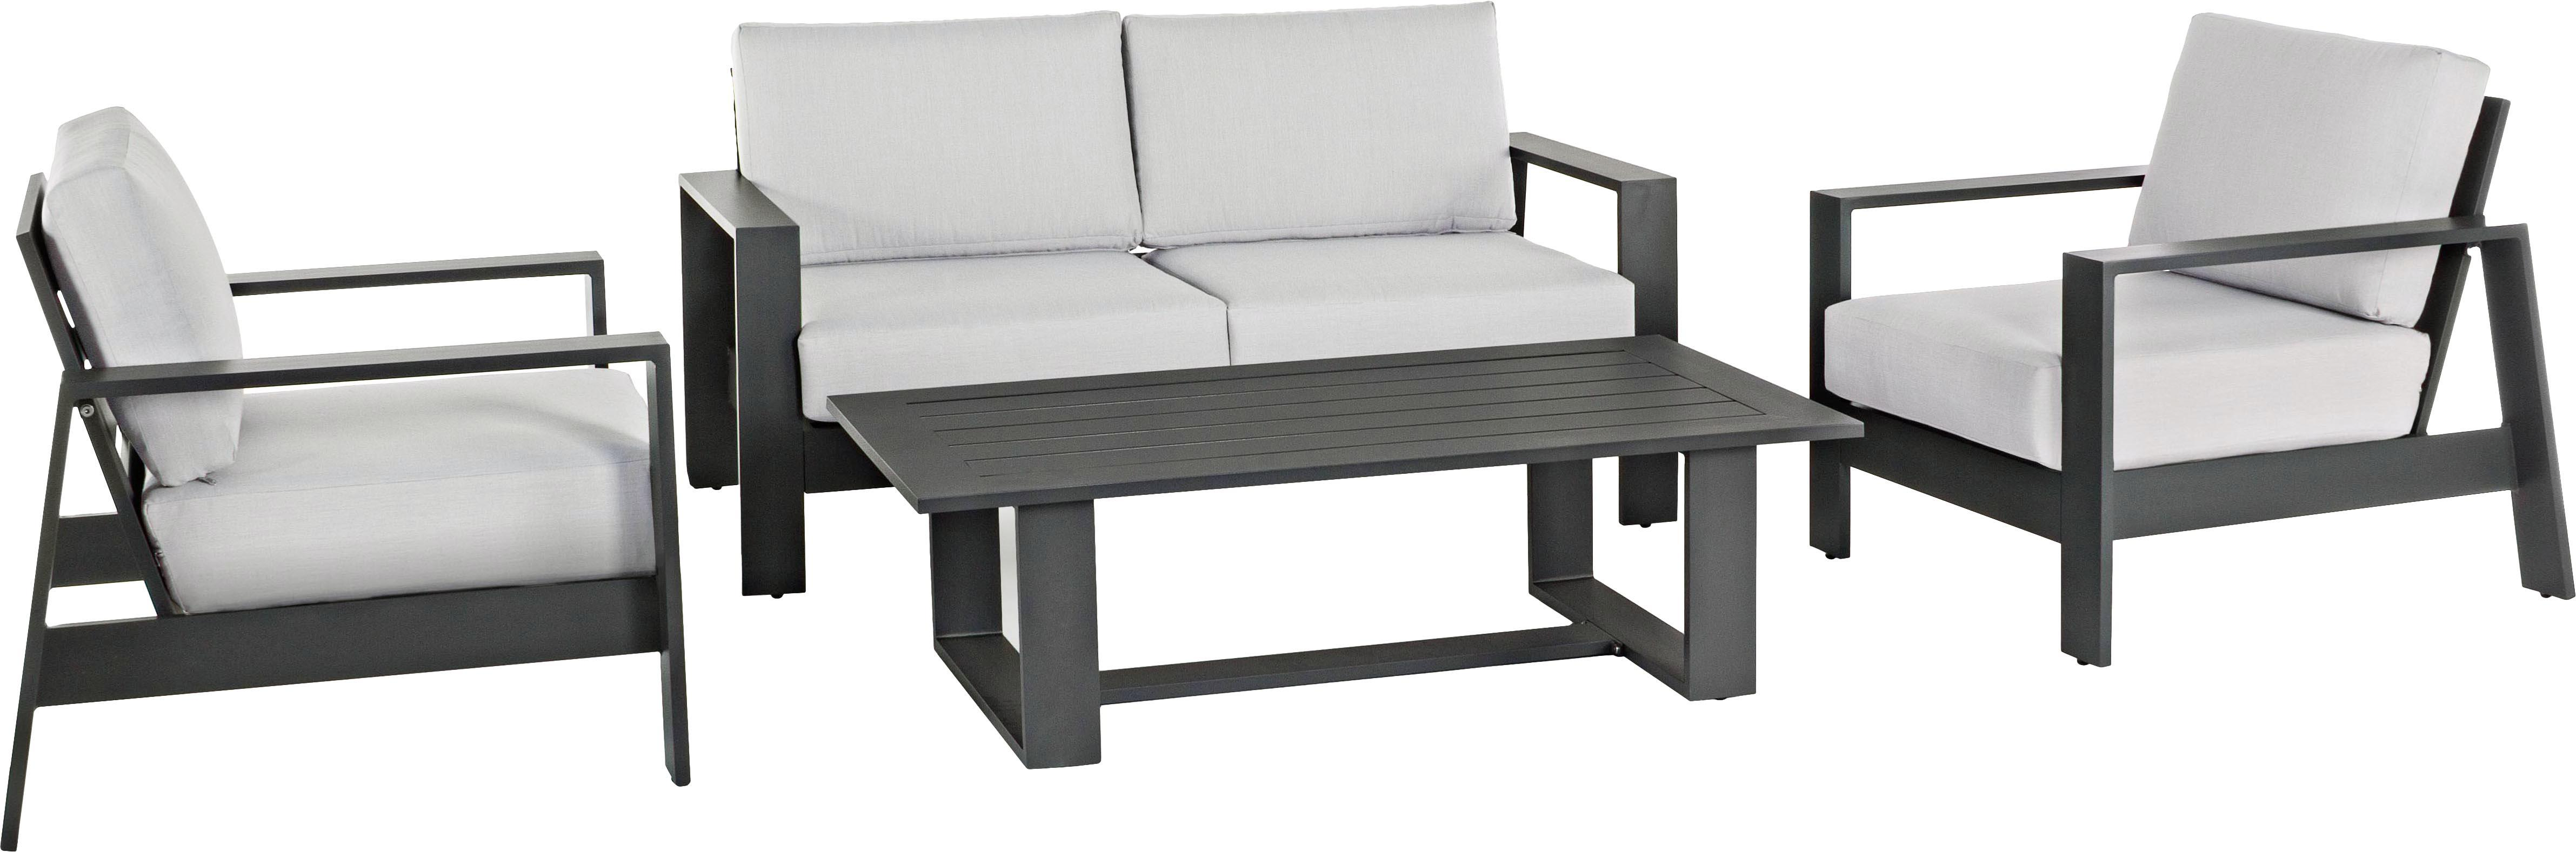 Set lounge de exterior Atlantic, 4pzas., Estructura: aluminio con pintura en p, Tapizado: poliéster, Gris antracita, gris claro, Tamaños diferentes